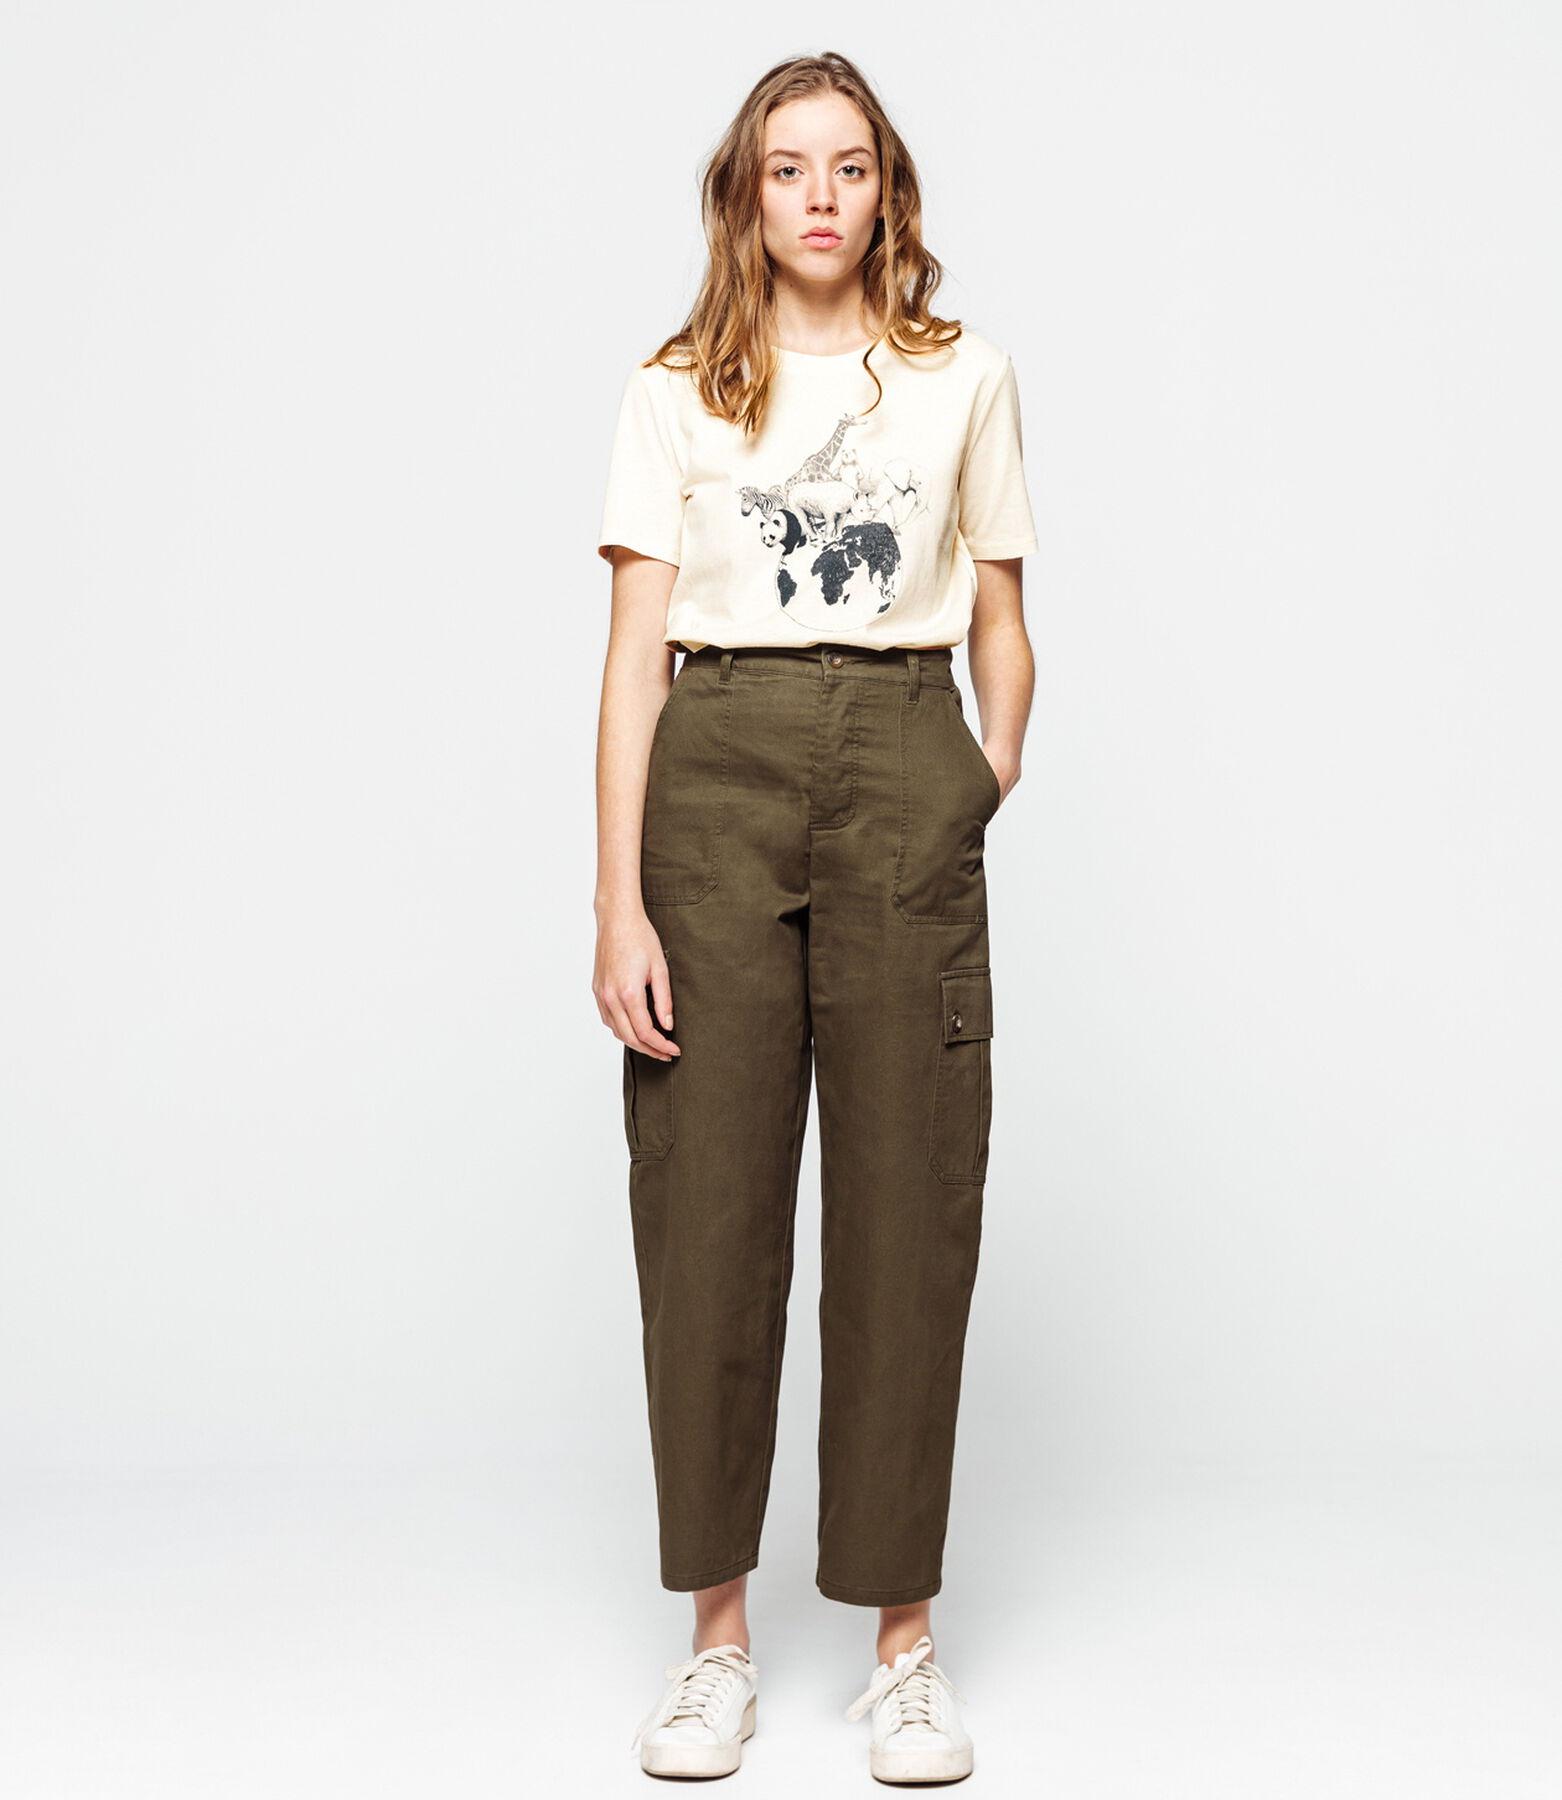 T-shirt animaux en coton polyester recyclé